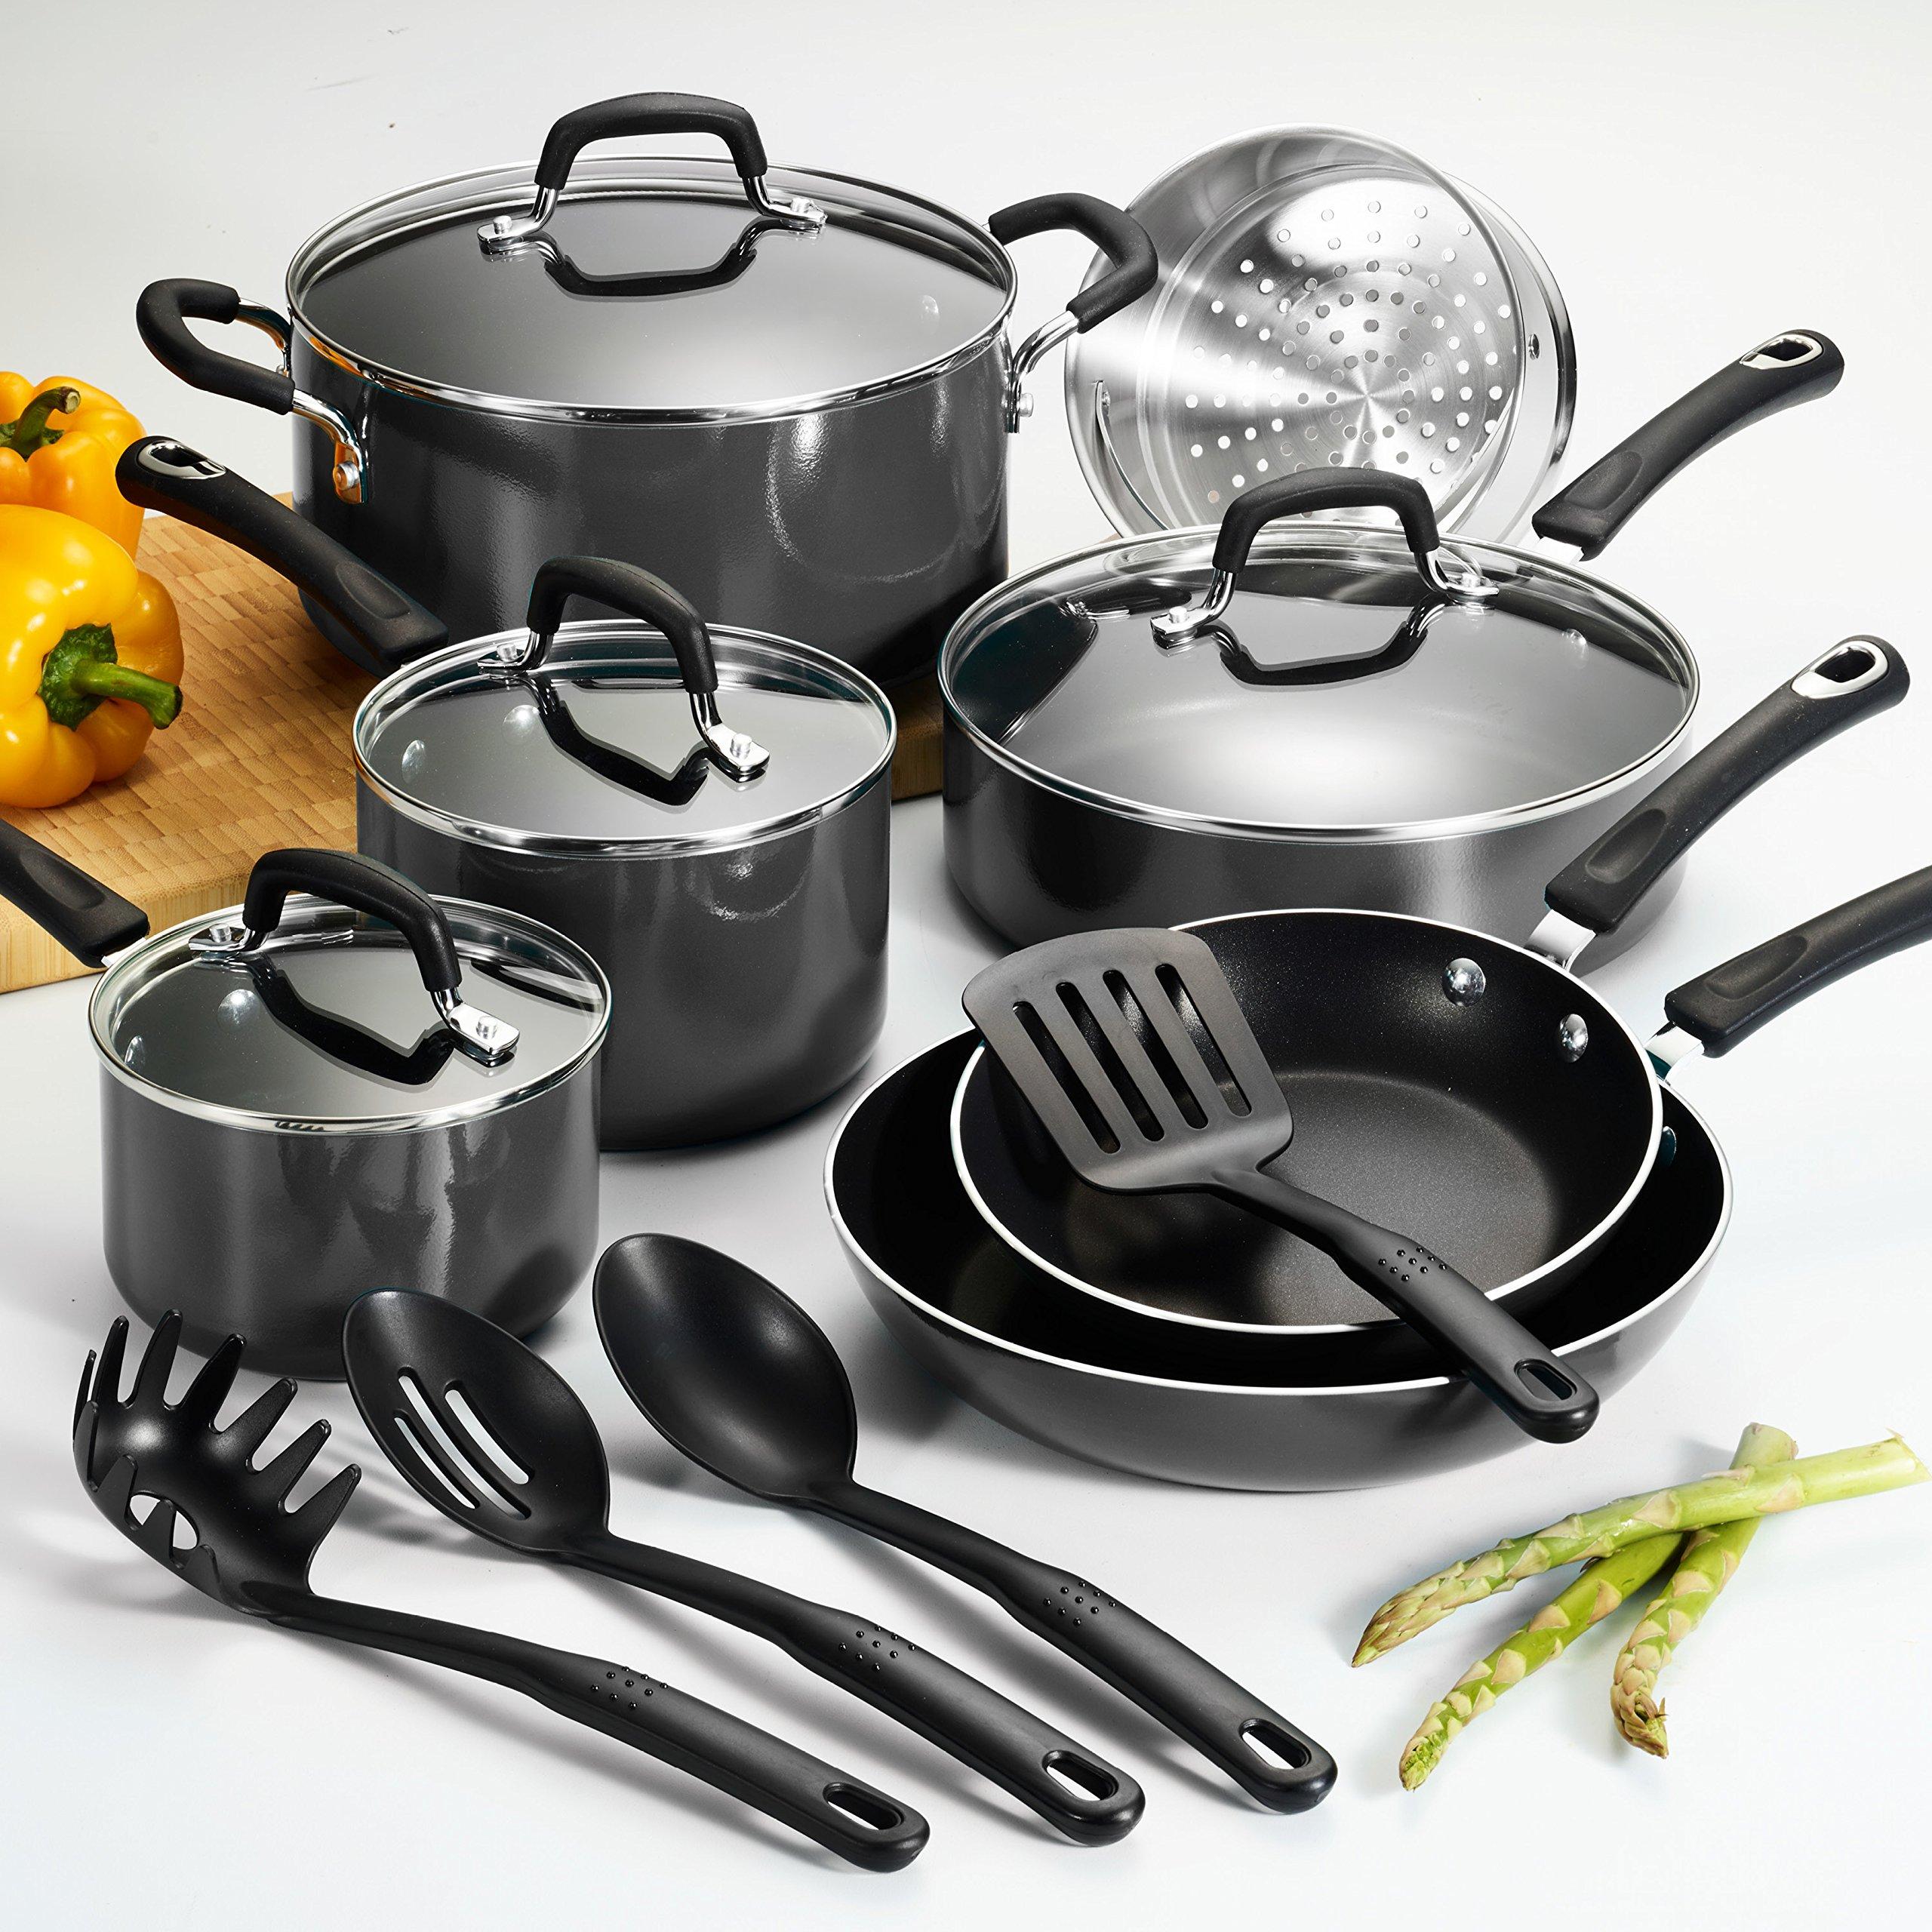 15-Pc Heavy Gauge Aluminum Vessels Teflon Interior Nonstick Grey Cookware Set